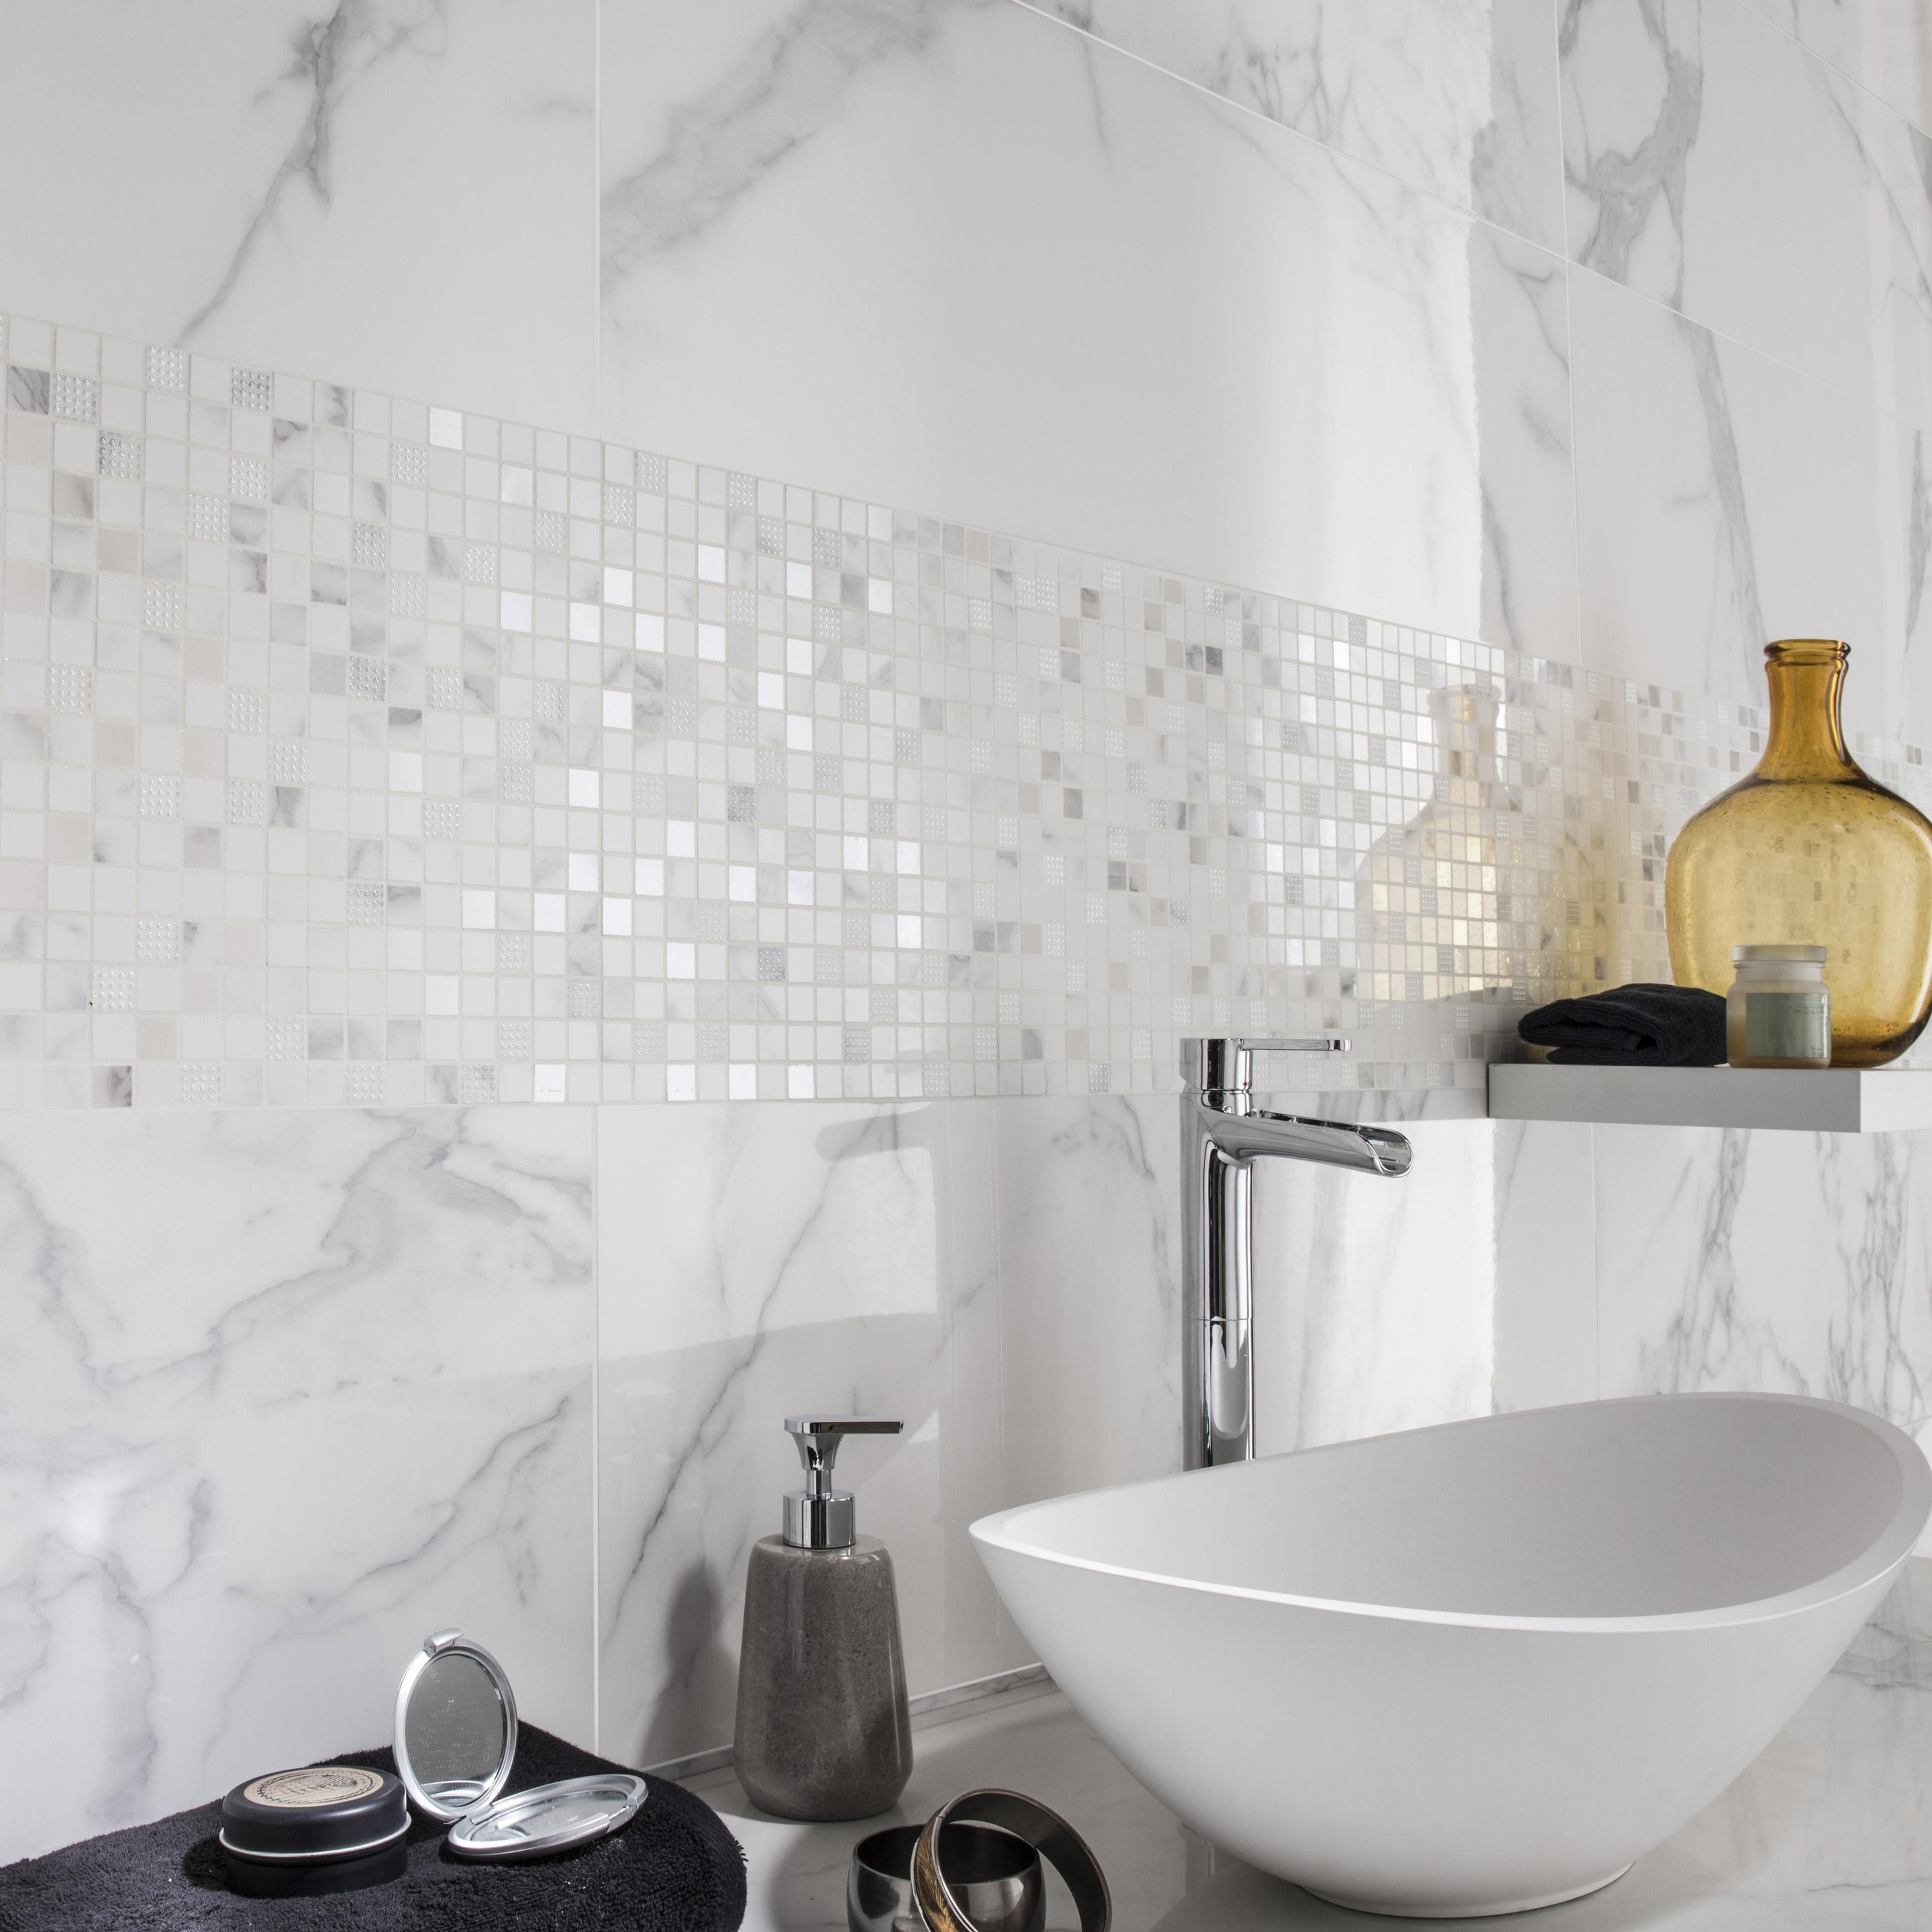 Faïence mur intenso marbre blanc carrare brillant l.30.5 x L.91.5 cm, Murano